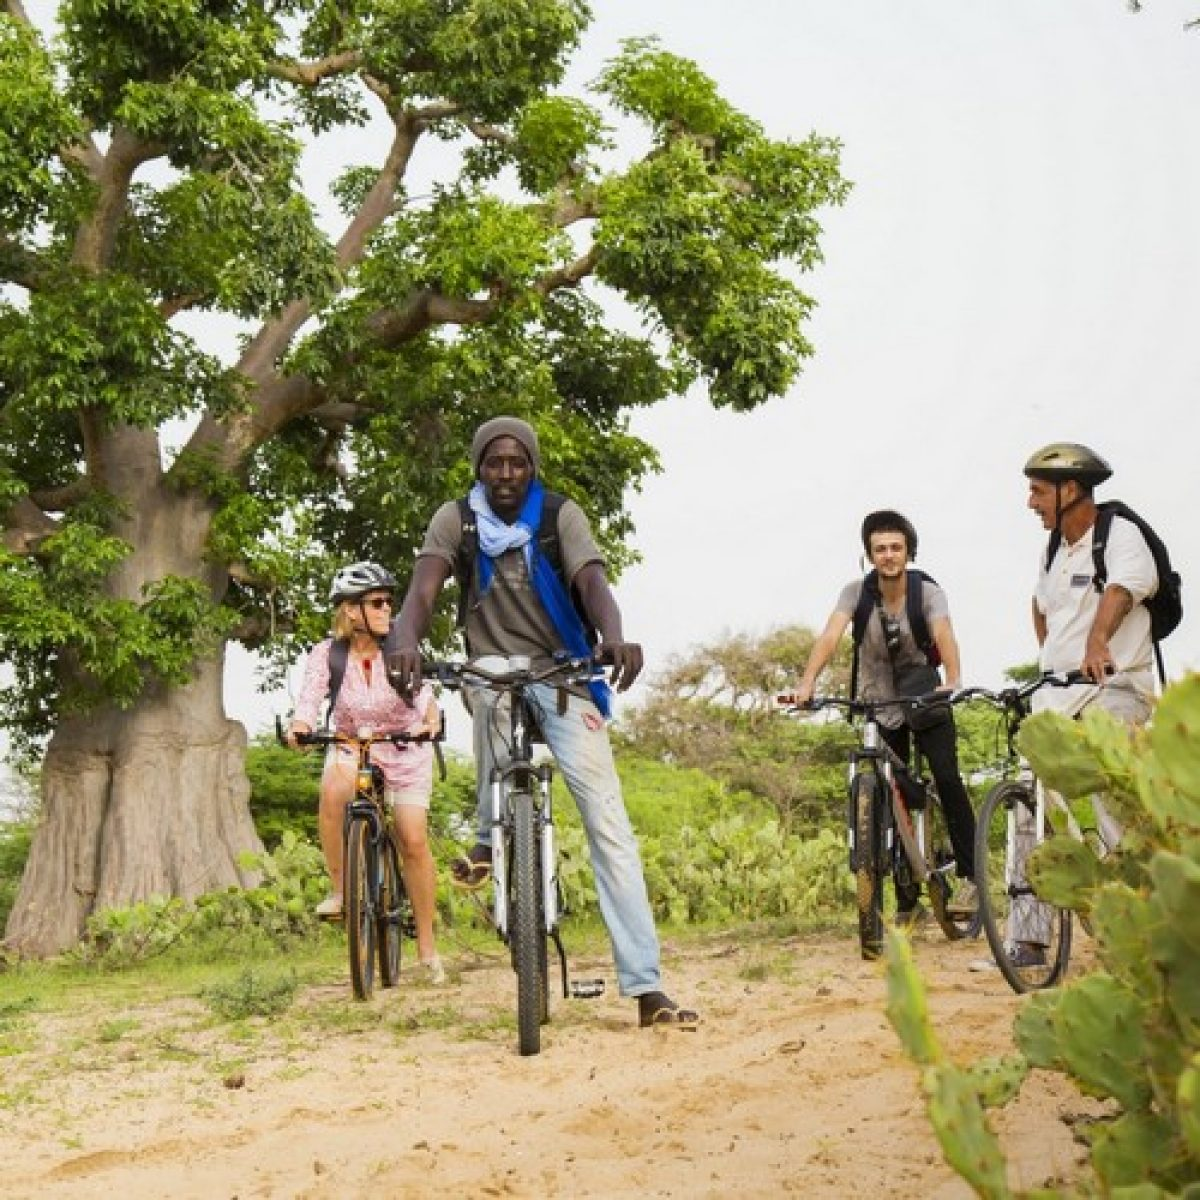 Bike Adventure (20 km) - Day